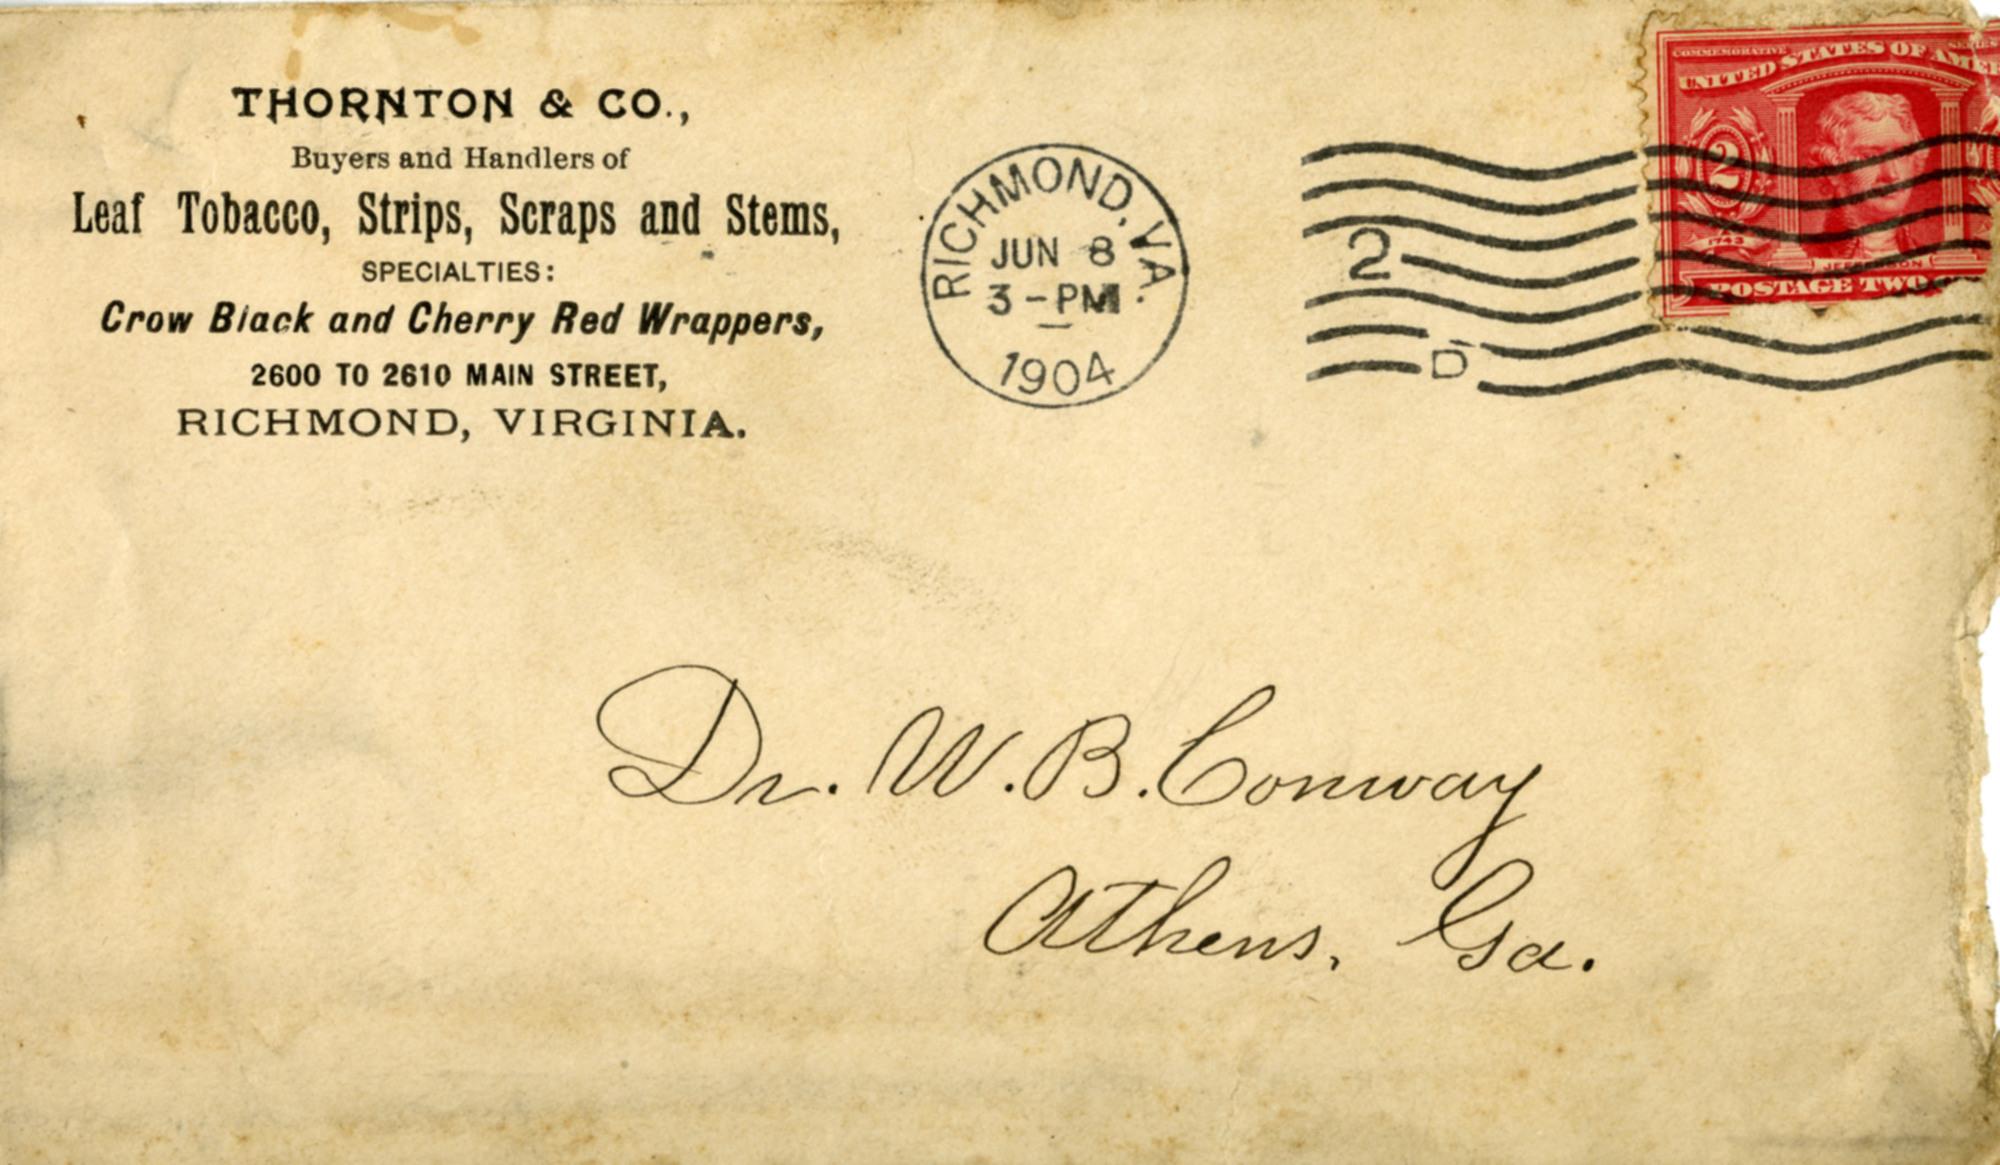 http://spec.lib.vt.edu/pickup/Omeka_upload/Ms2012-039_ConwayCatlett_F5_Letter_1904_0608_enva.jpg